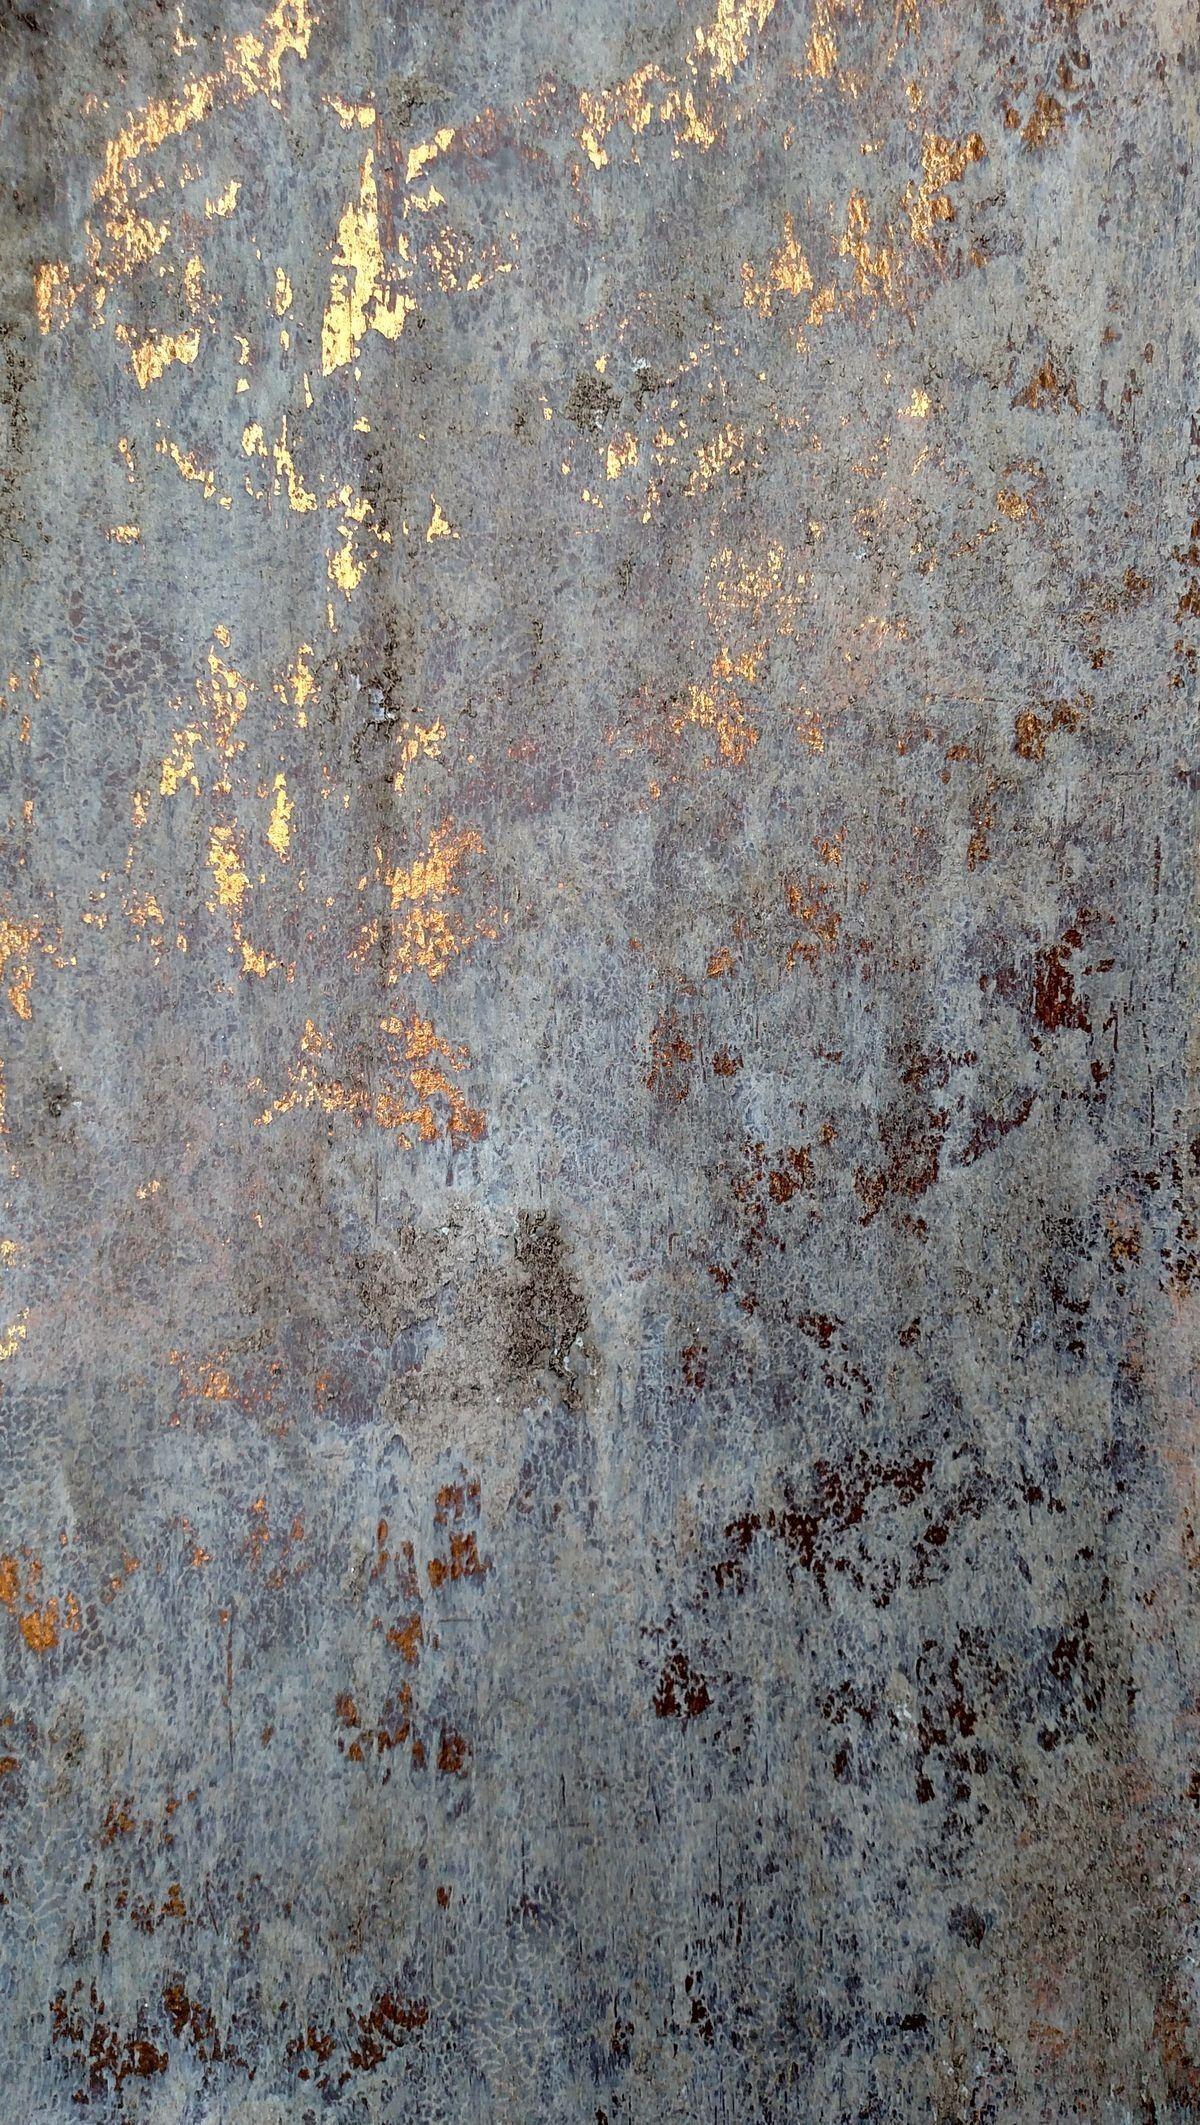 Fantastic Wallpaper Marble Metallic - bb2161692c4c2e929df9e975bb797a61  Perfect Image Reference_432522.jpg